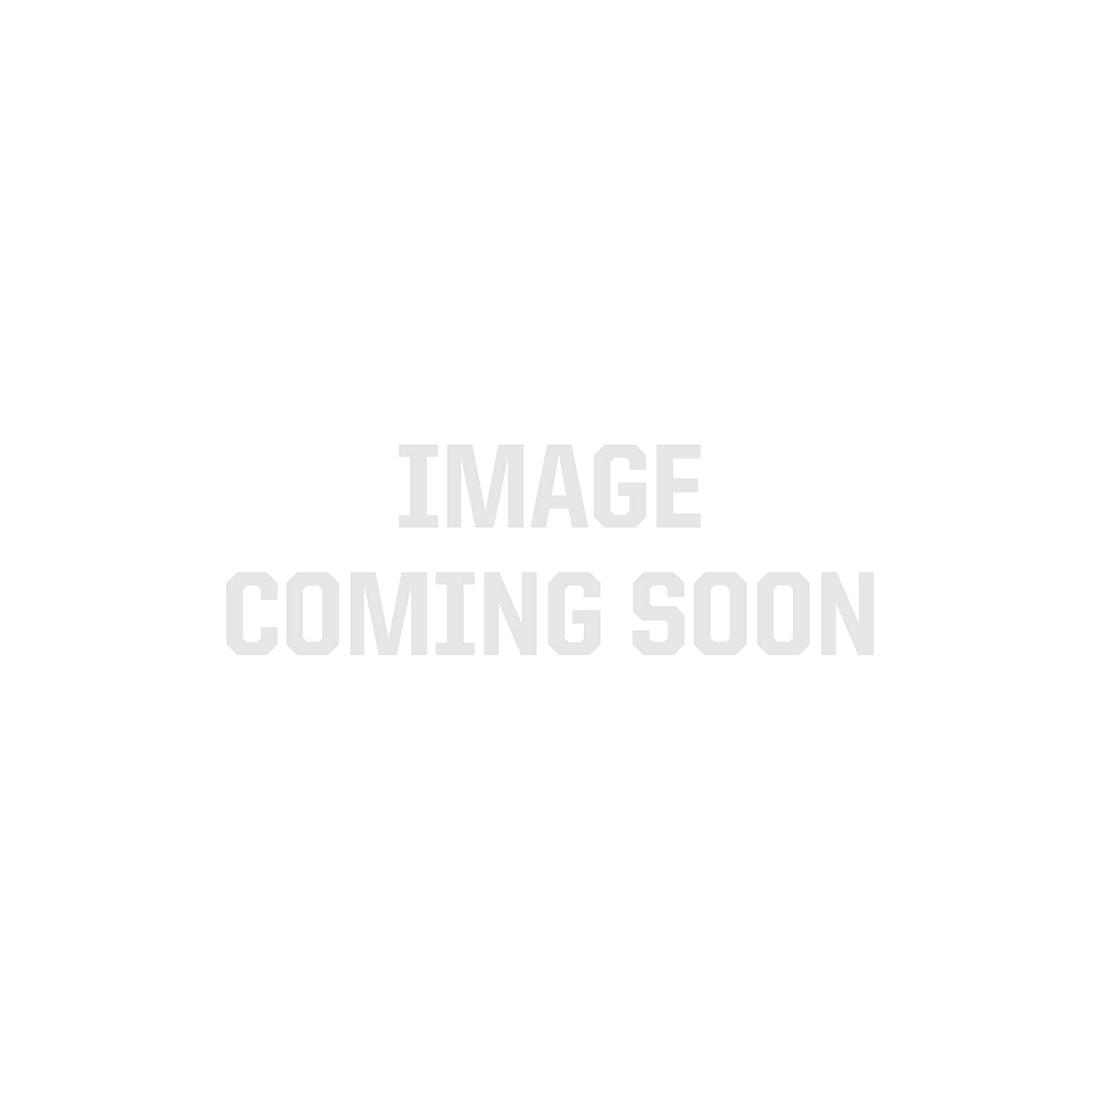 UltraSlim 2016 LED Strip Light - 4,000K - 120/m - 5m Reel